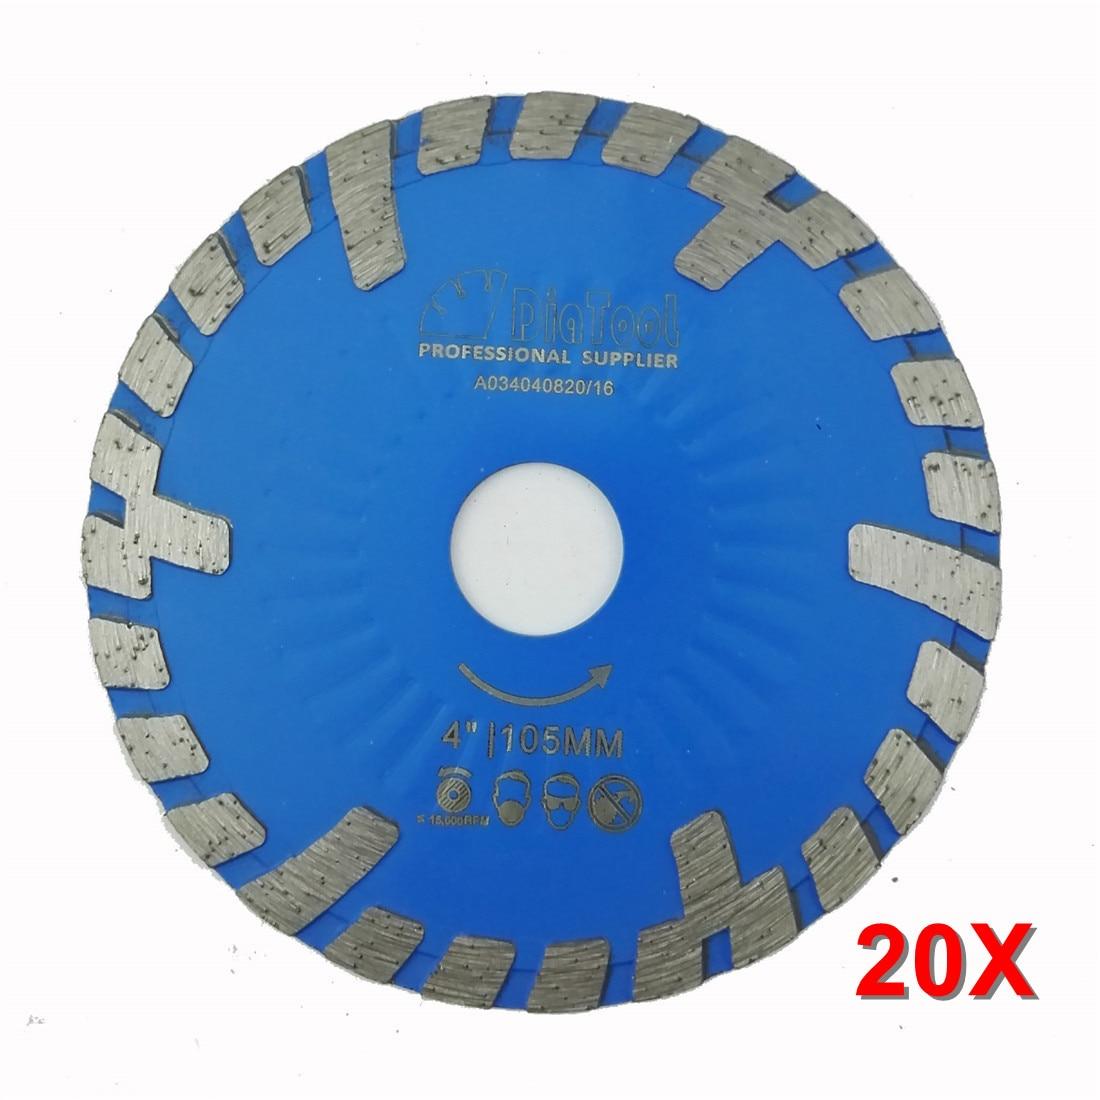 20pcs 105mm Hot Pressed Diamond Turbo Blade With Slant Protection Teeth 4 INCH Diamond Cutting Disc Stone Concrete Diamond Wheel